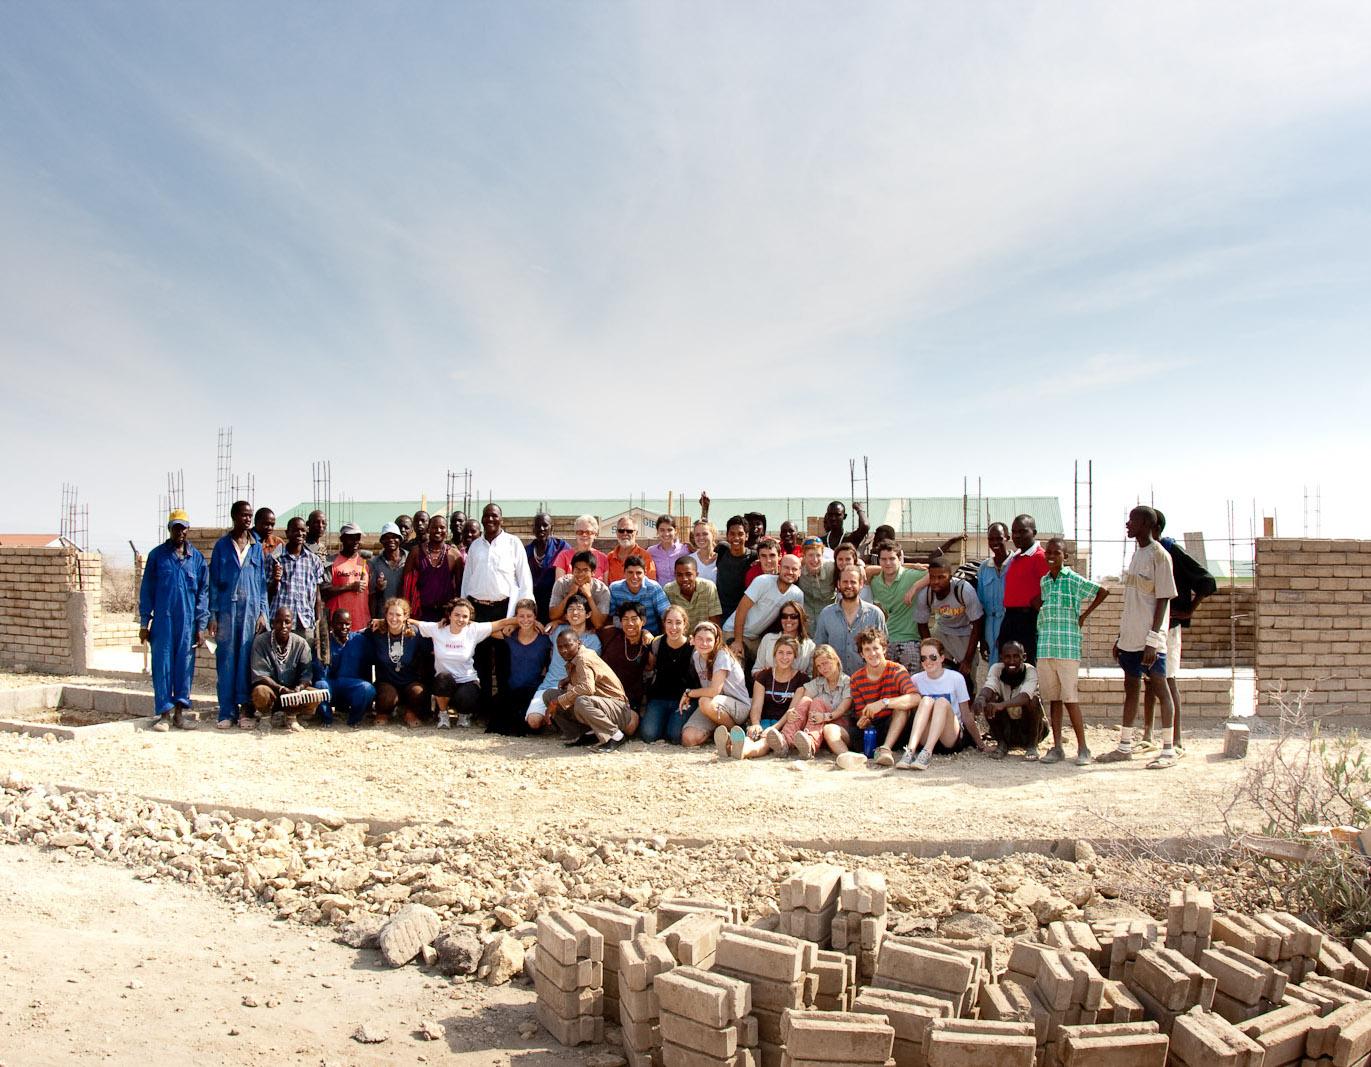 Kenya pro bono design project by Renée del Gaudio Architecture.